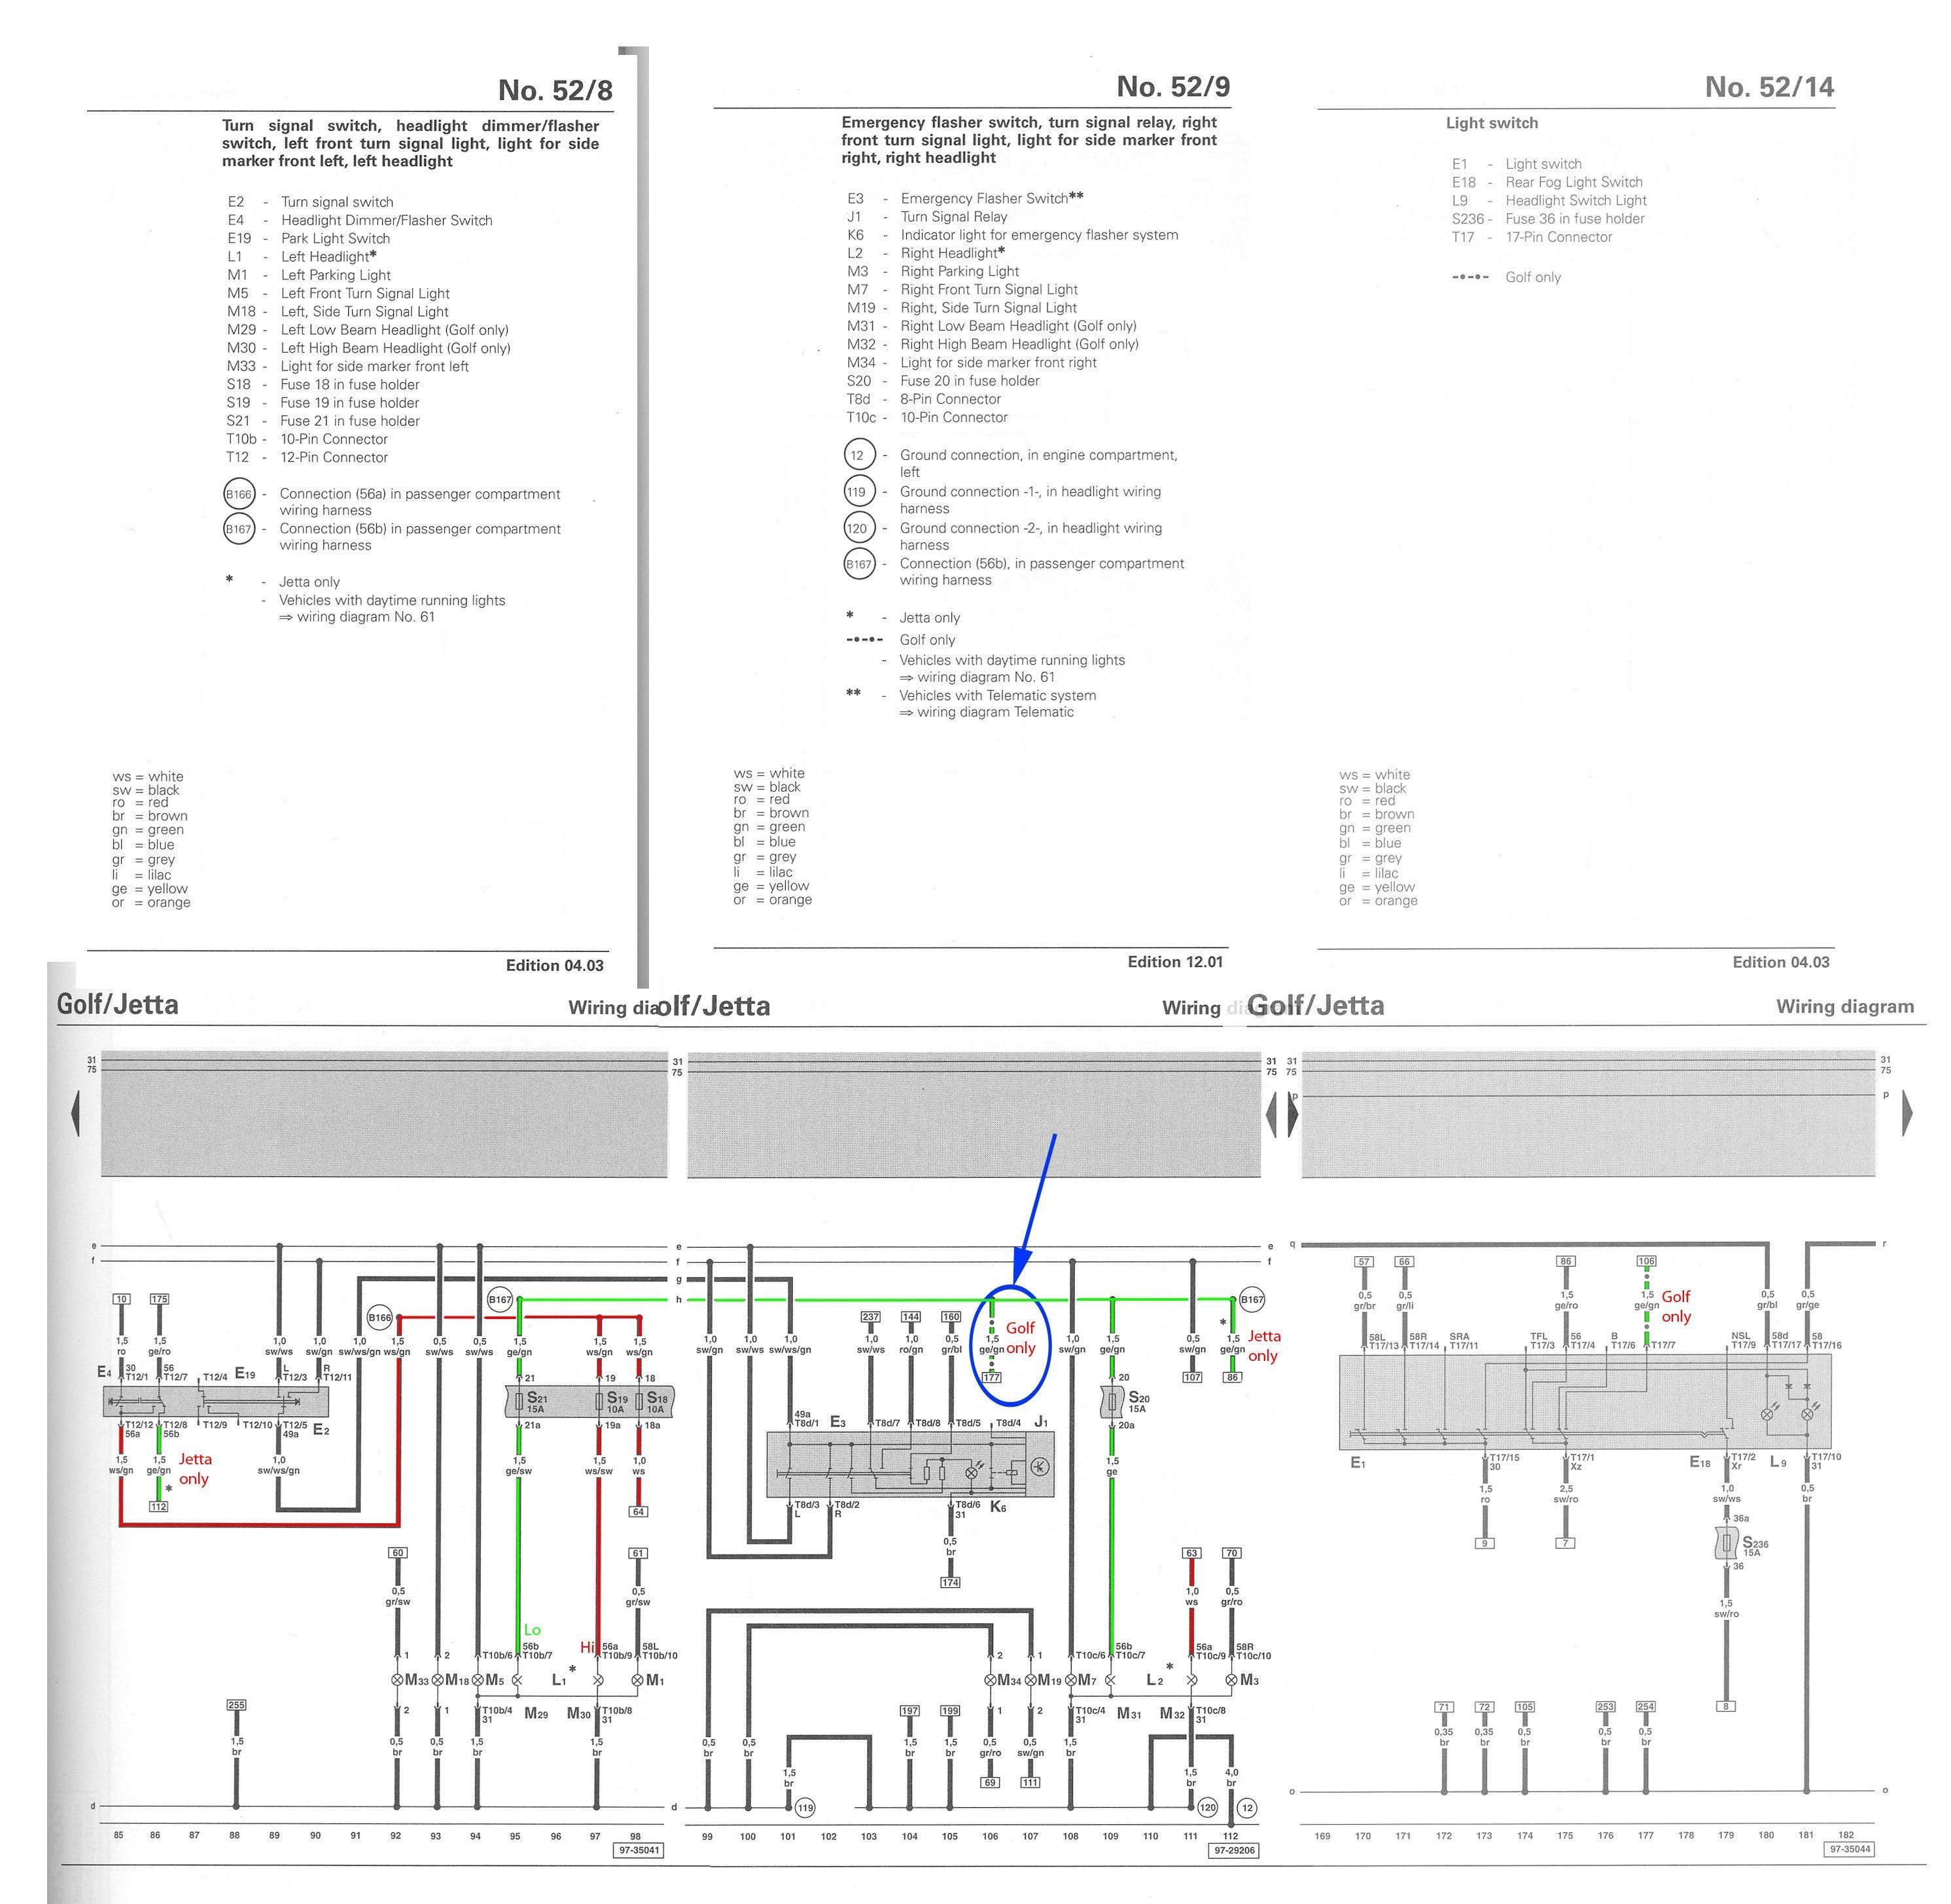 Unique Audi A4 B8 Headlight Wiring Diagram Diagram Diagramtemplate Diagramsample Check More At Https Servisi Co Audi A4 B8 Headlight Wiring Diagram